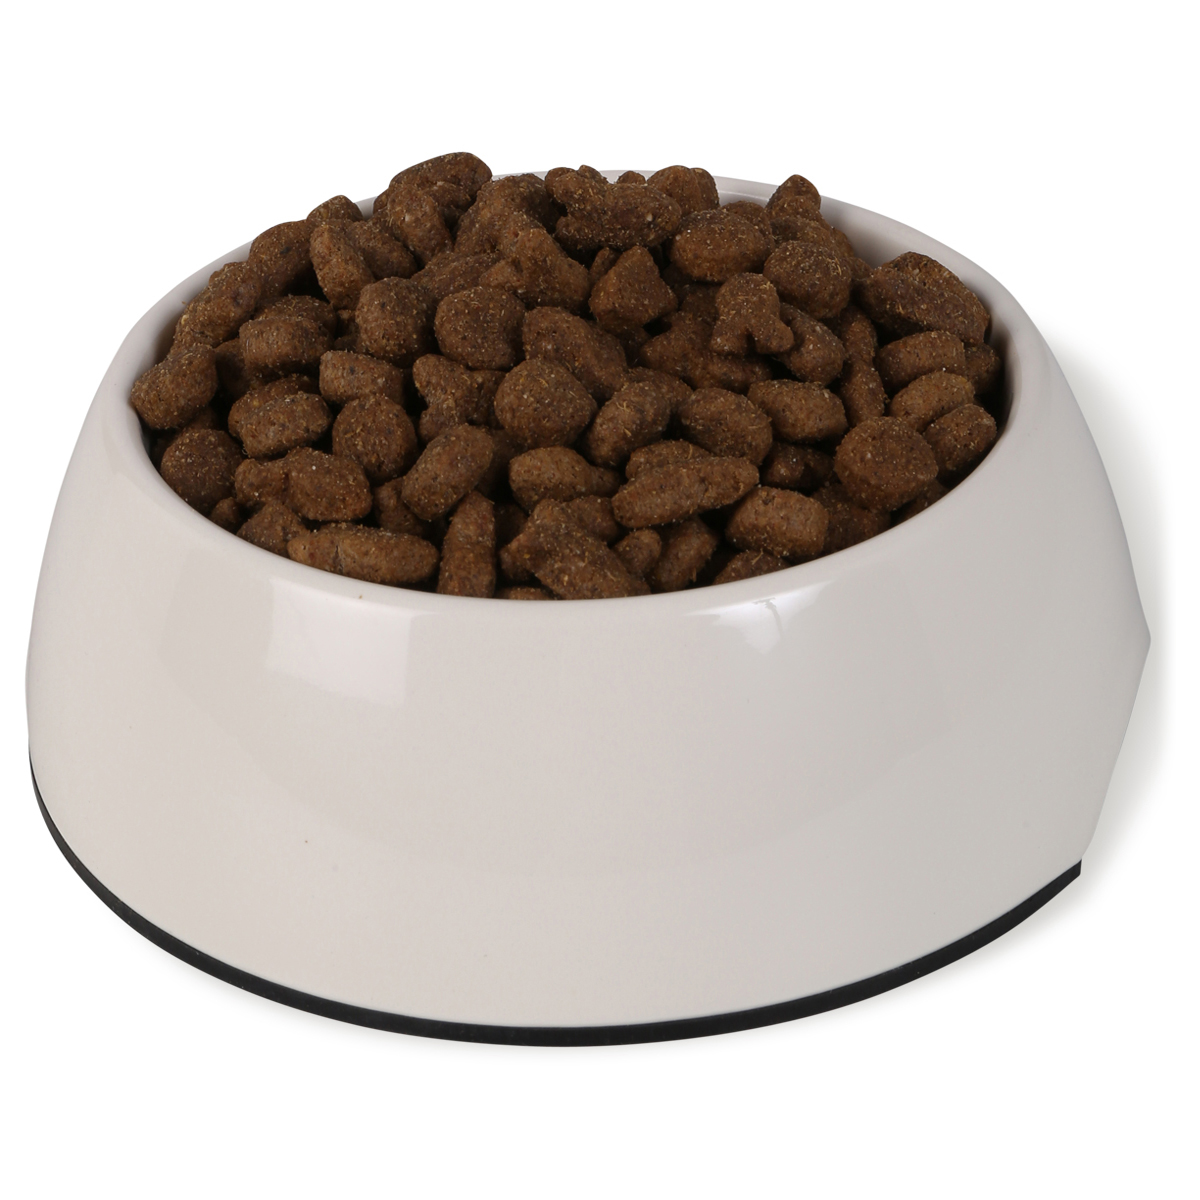 bosch hundefutter adult fisch kartoffel kaufen bei zooroyal. Black Bedroom Furniture Sets. Home Design Ideas